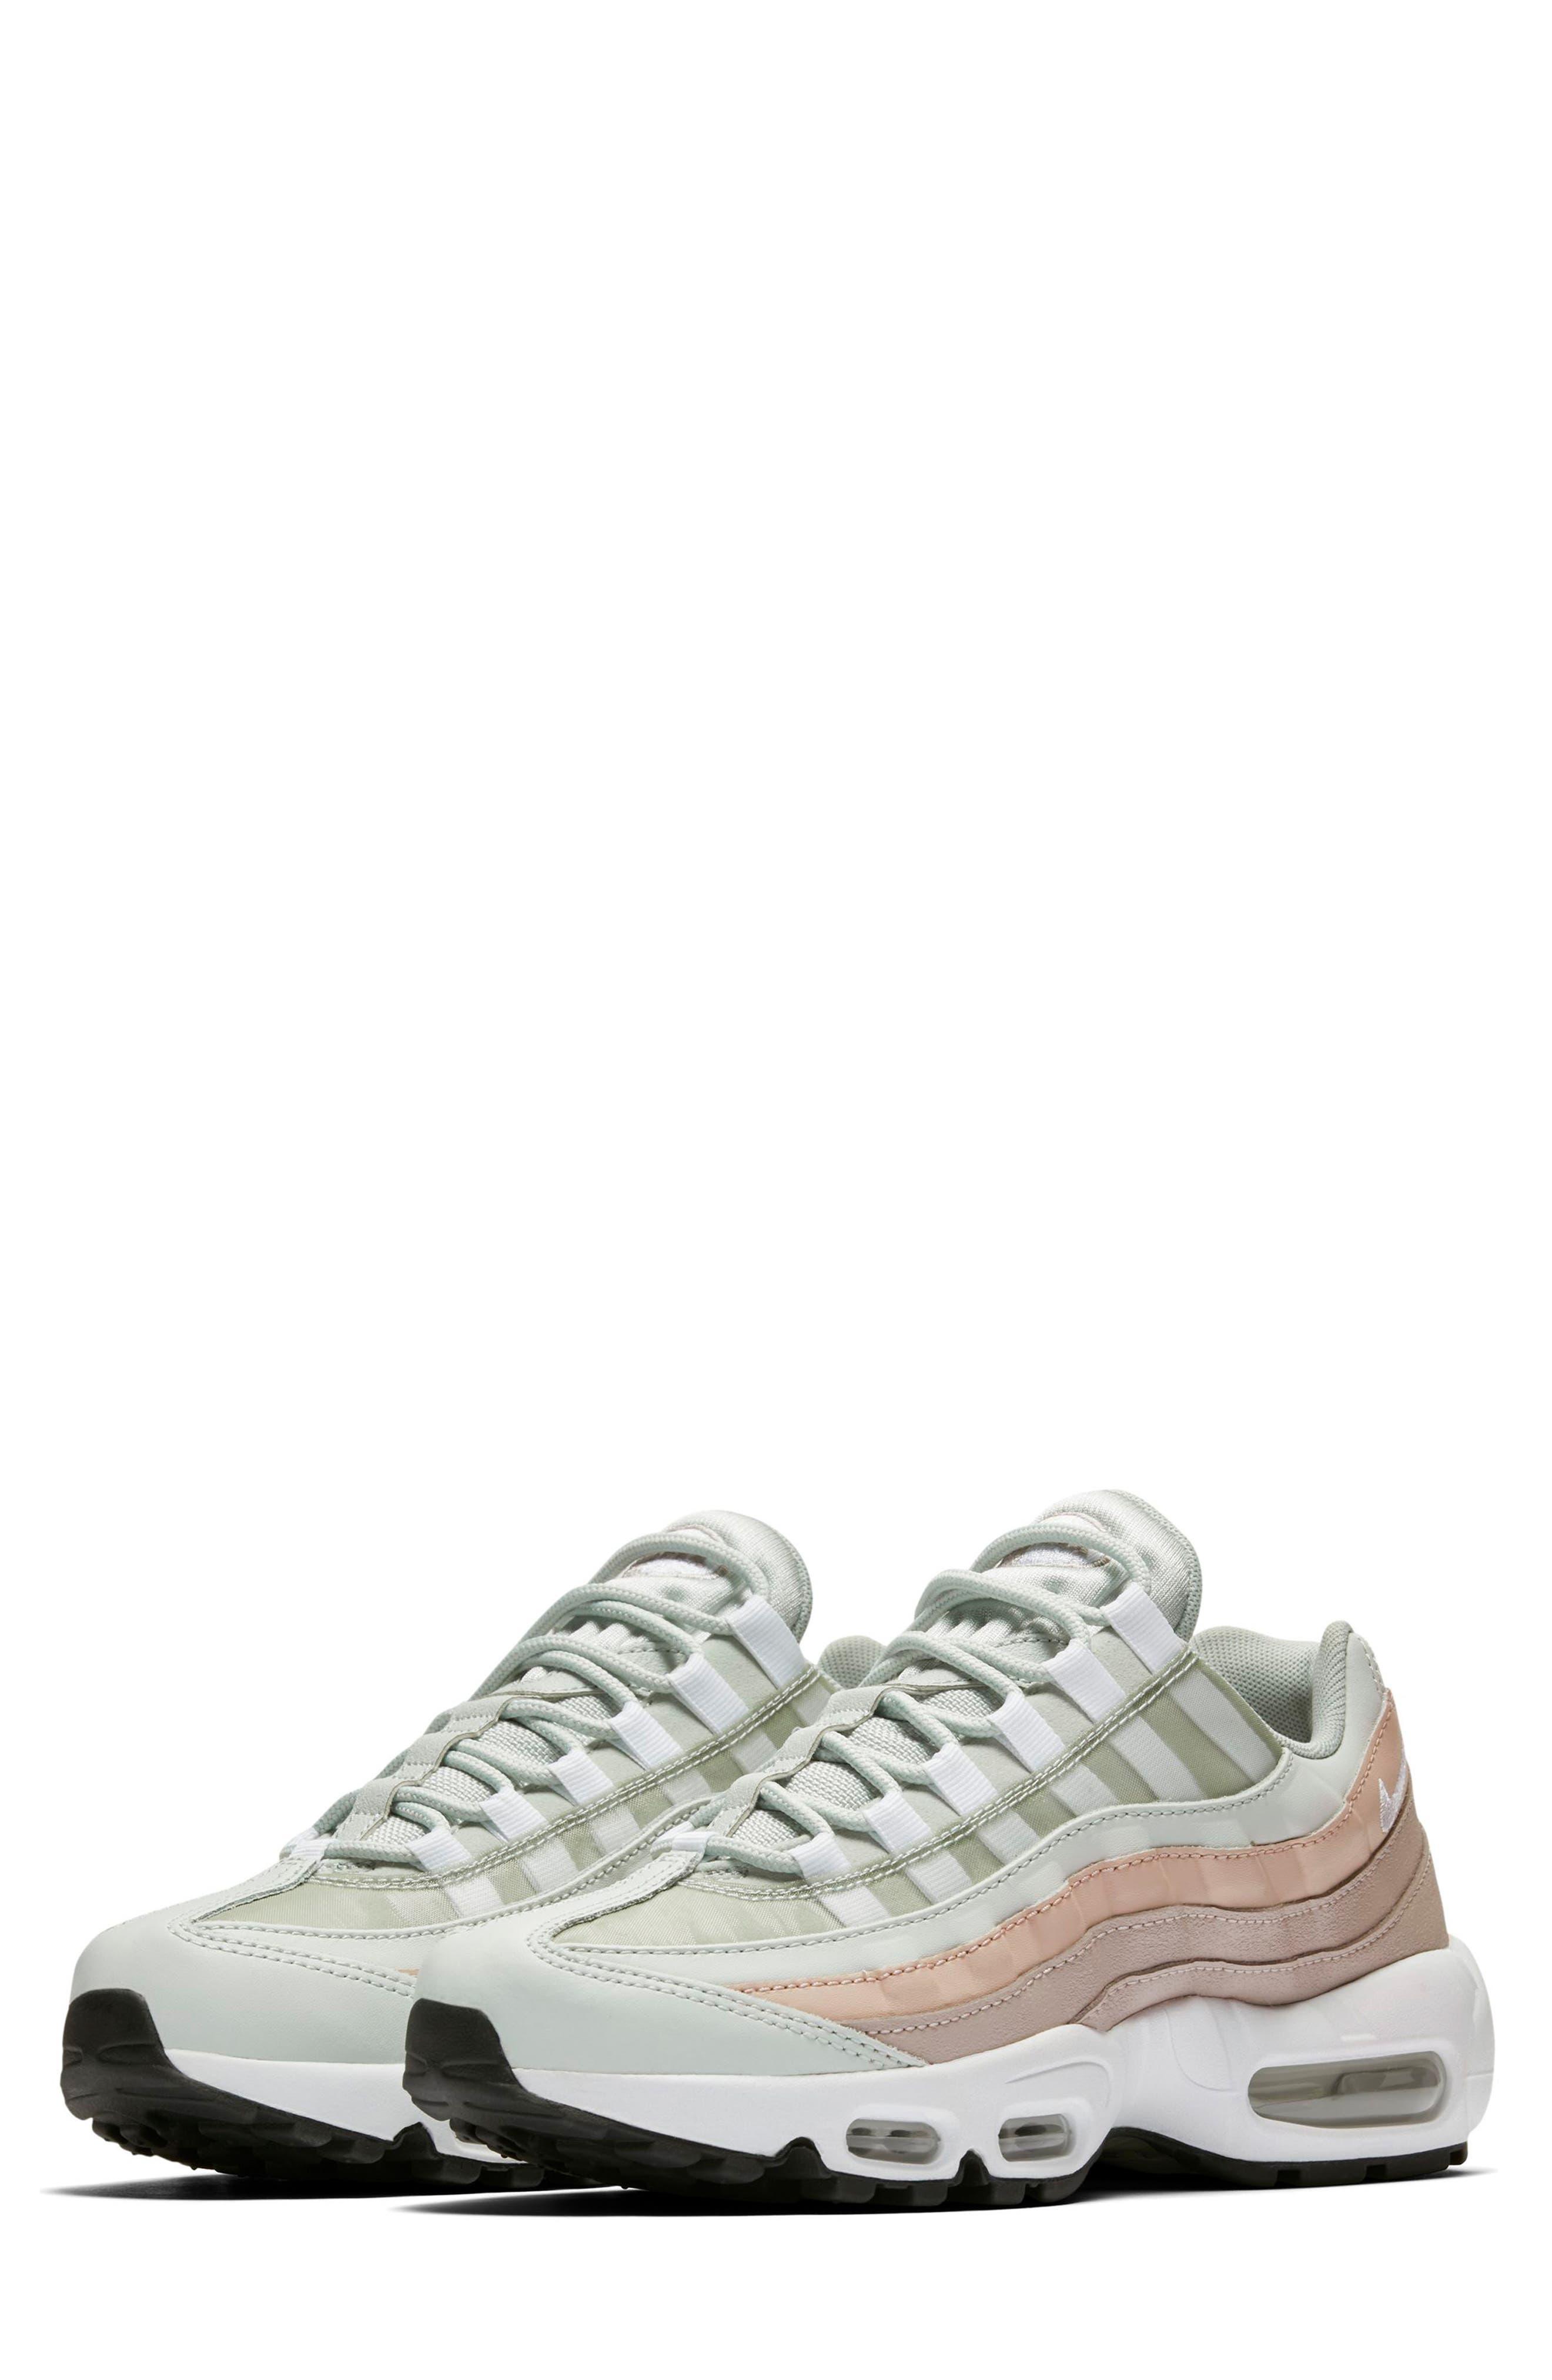 NIKE,                             Air Max 95 Running Shoe,                             Main thumbnail 1, color,                             SILVER/ WHITE/ MOON PARTICLE